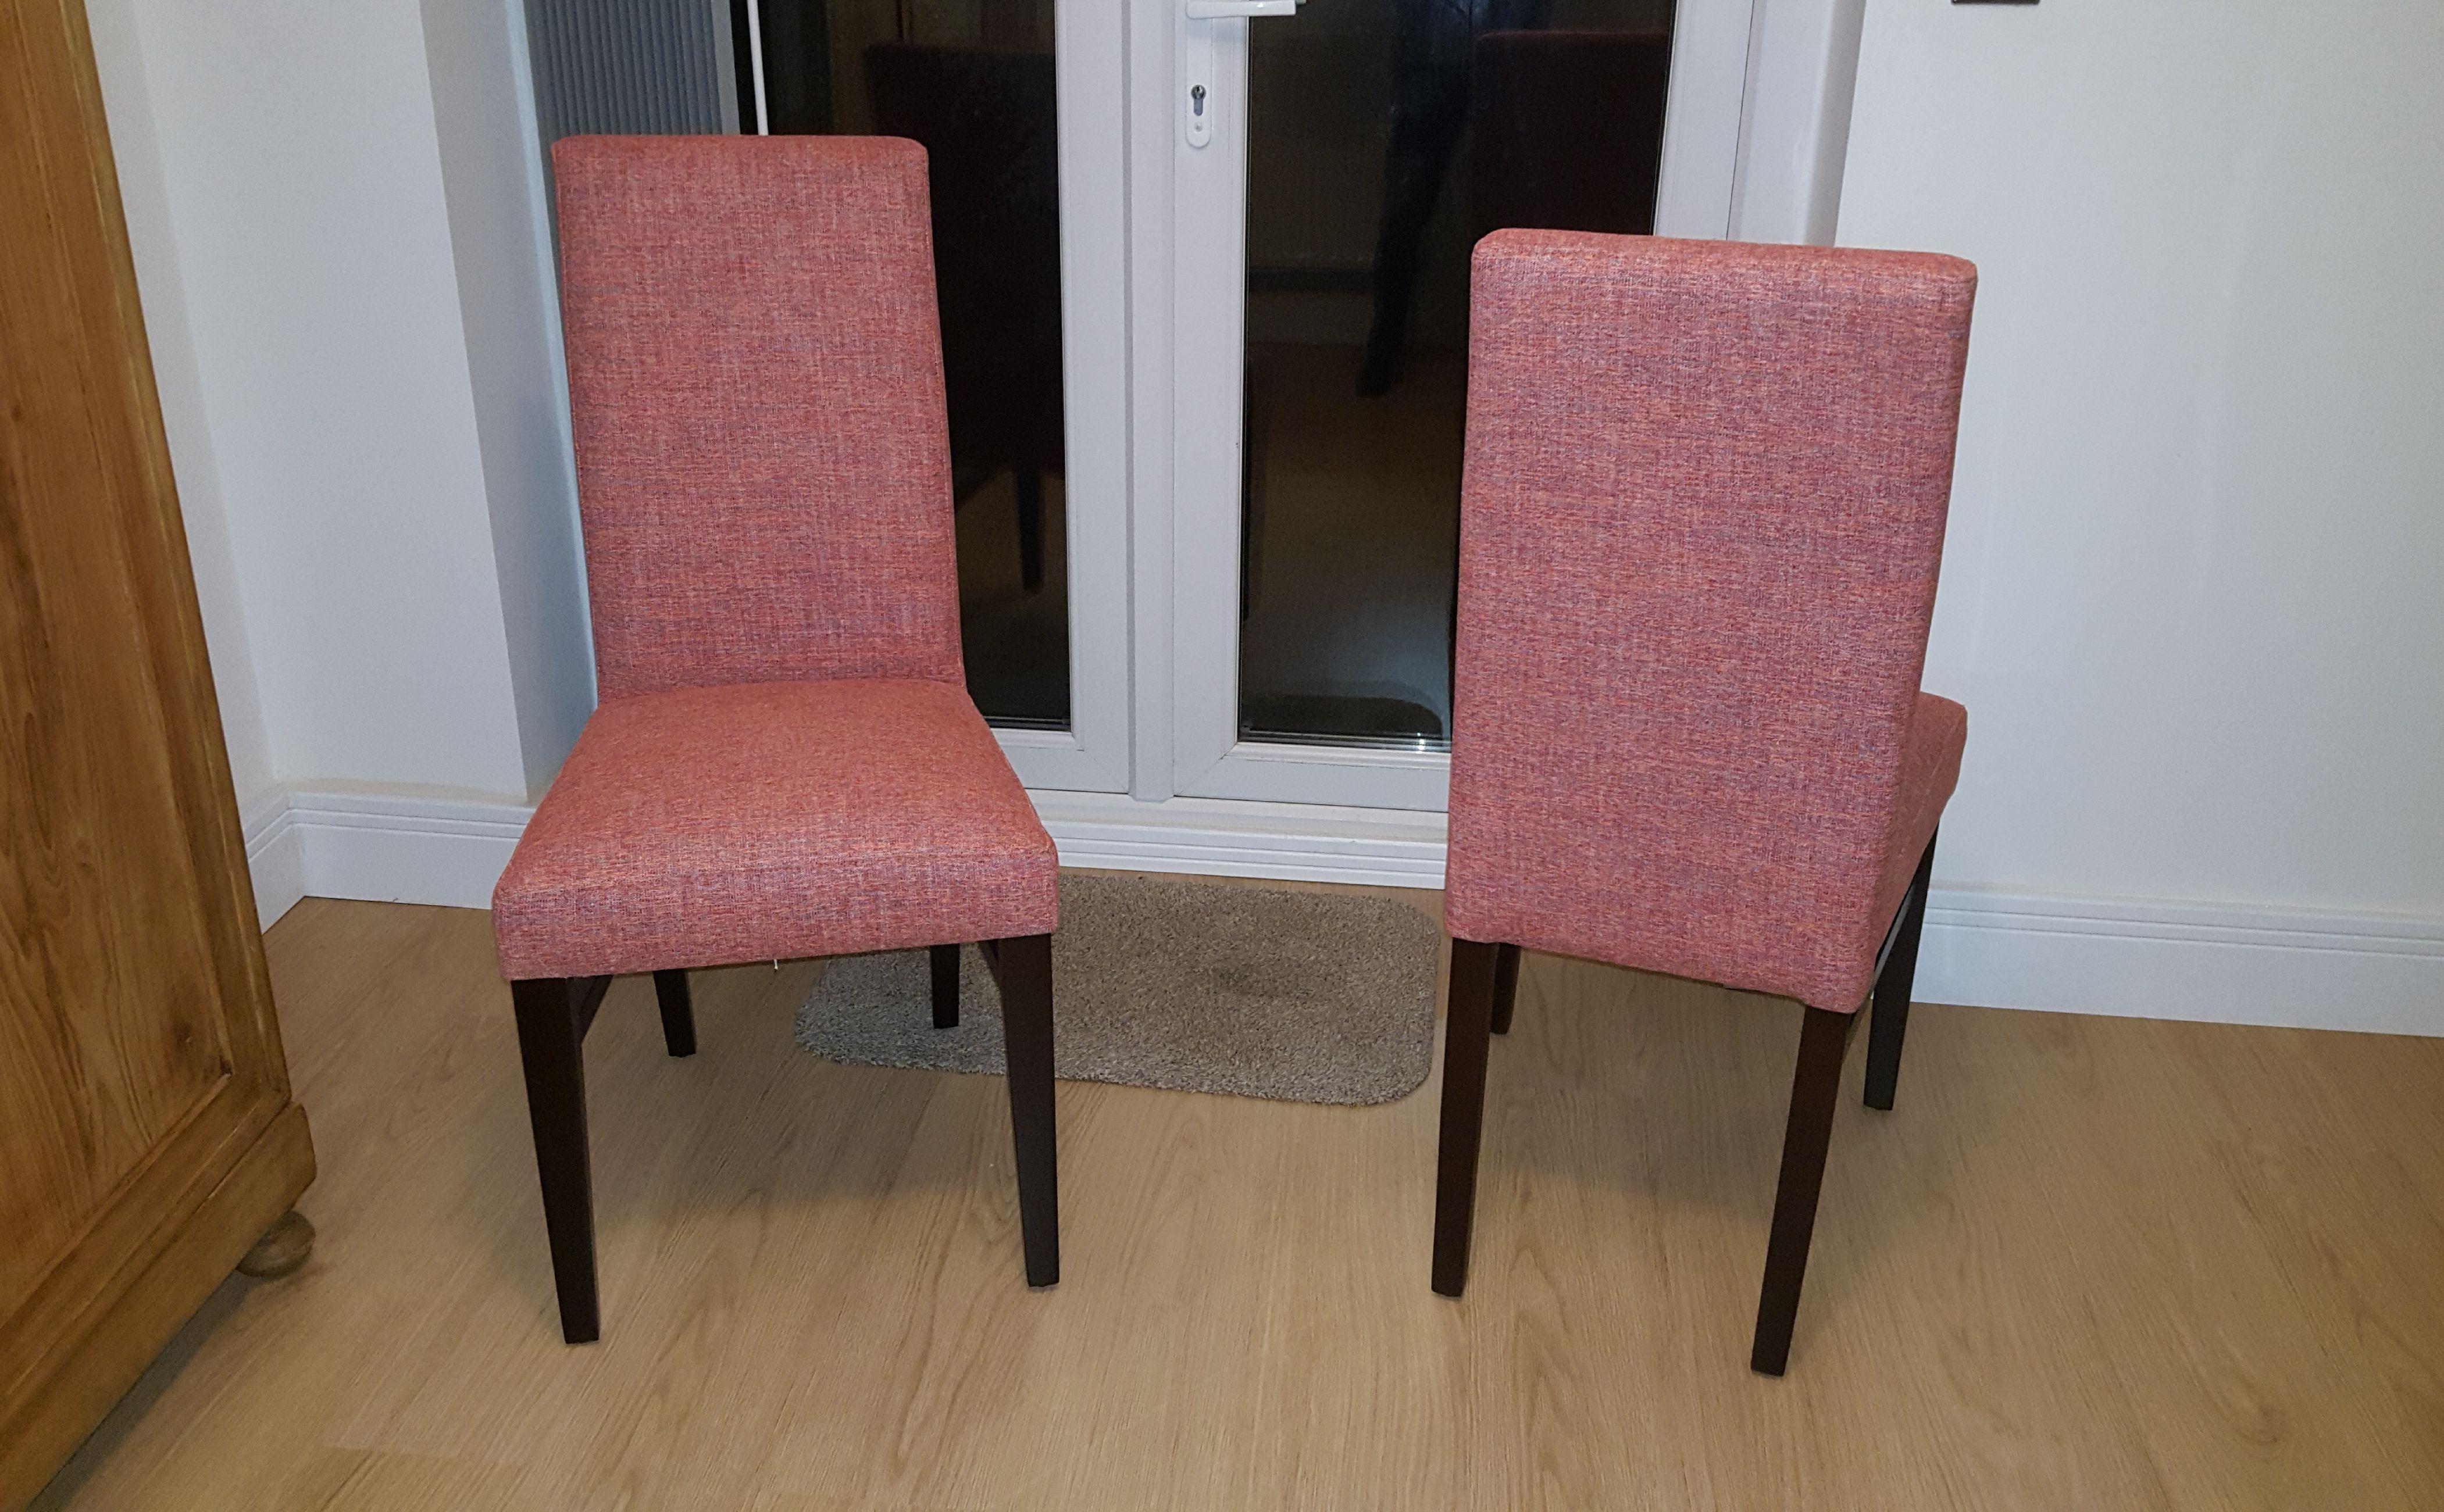 Our Paris Dining chairs in Aquaclean Darwin